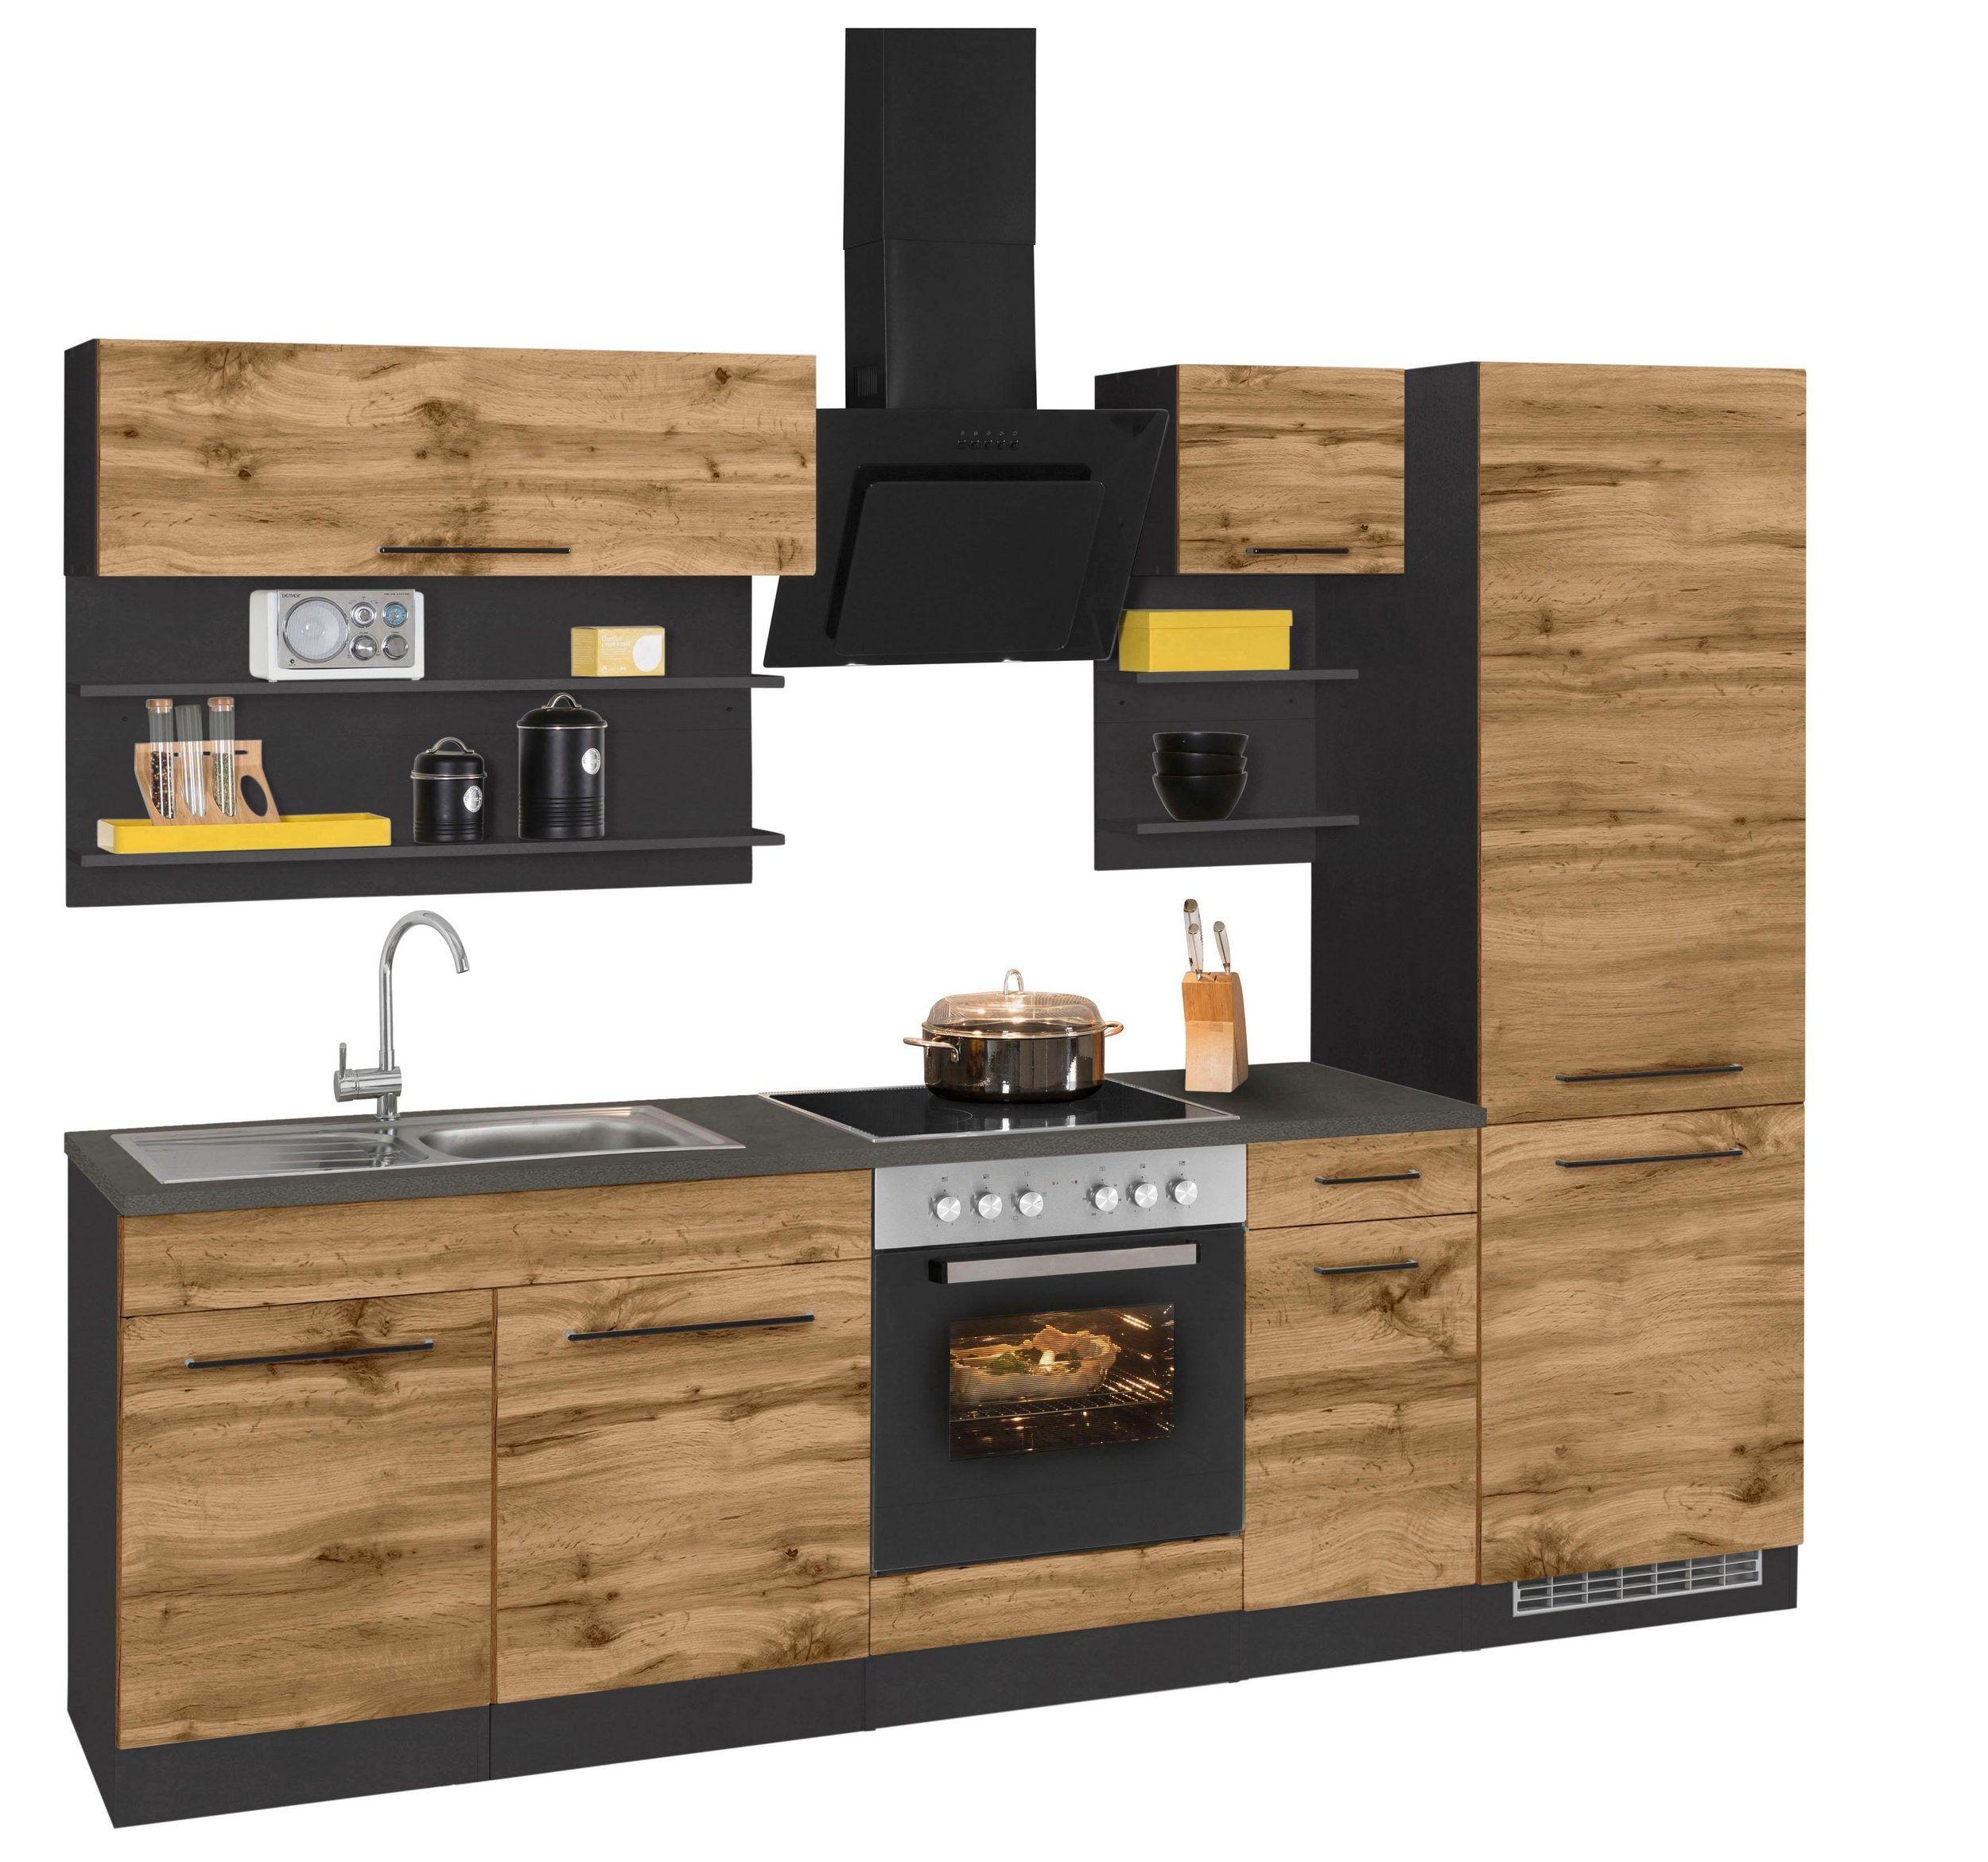 Held Mobel Kitchen Cabinet I Shape Held Kitchen Fittings Interior Design Kitchen Office Interior Design